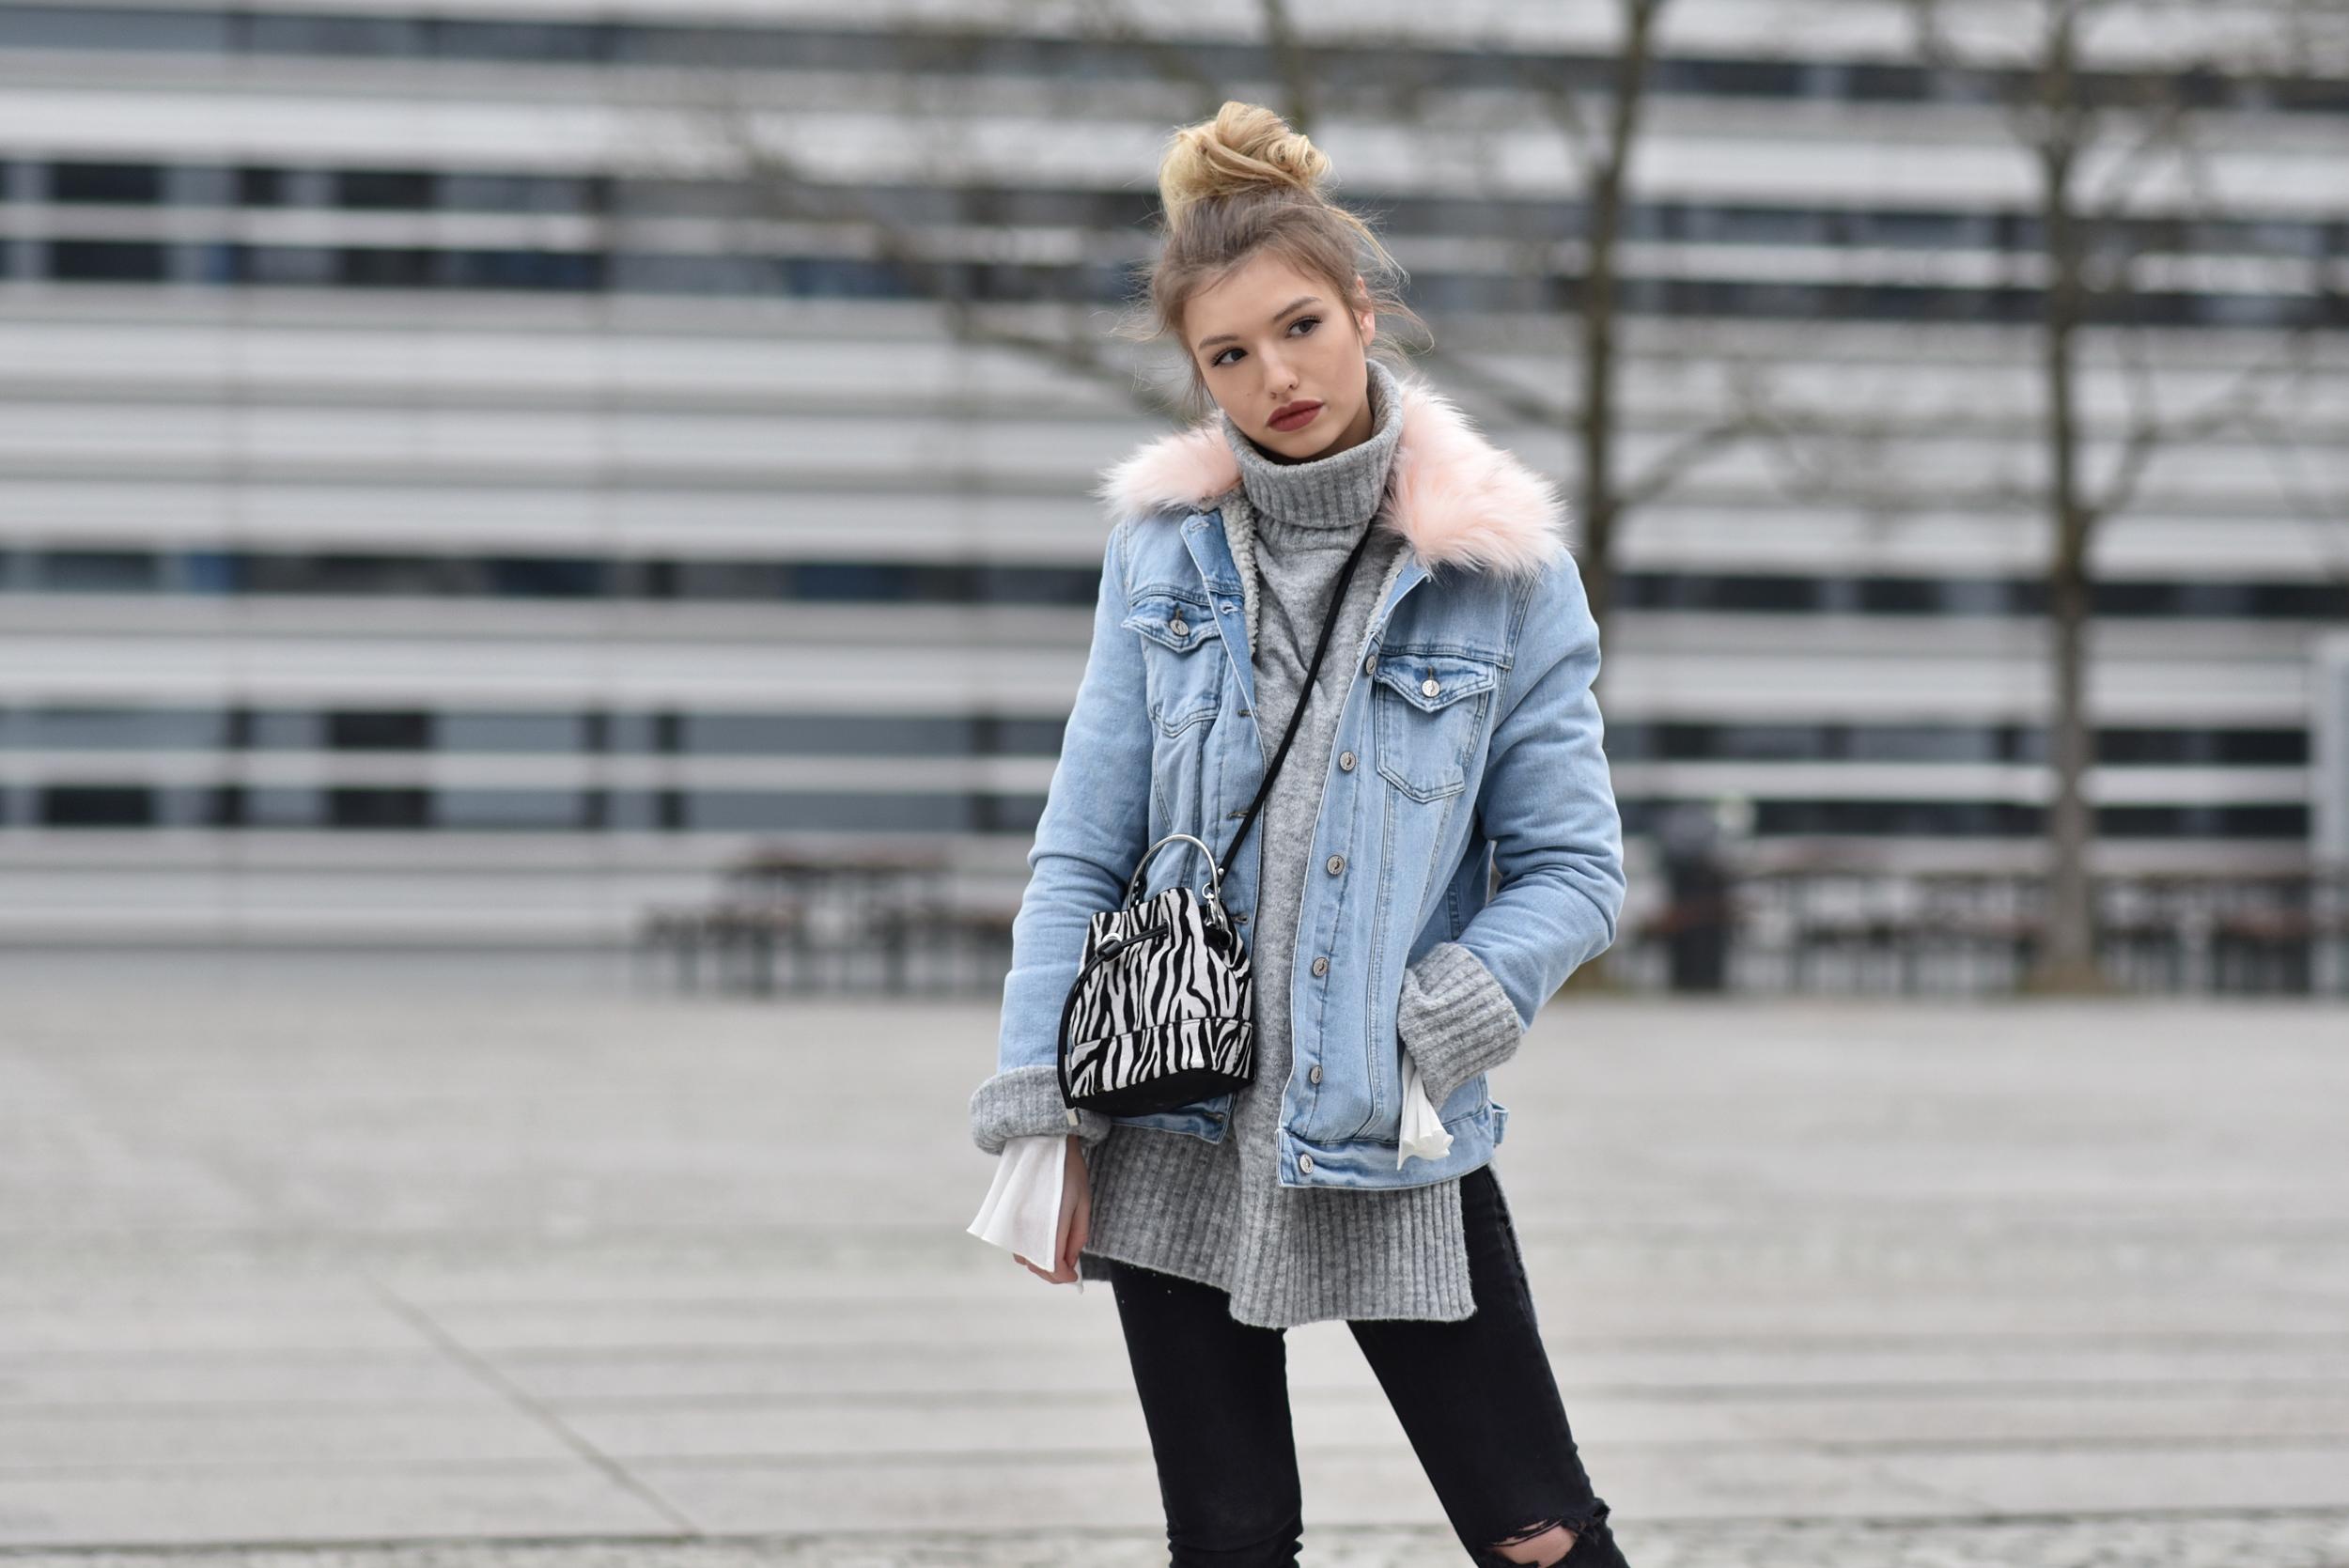 Jeansjacke blogger